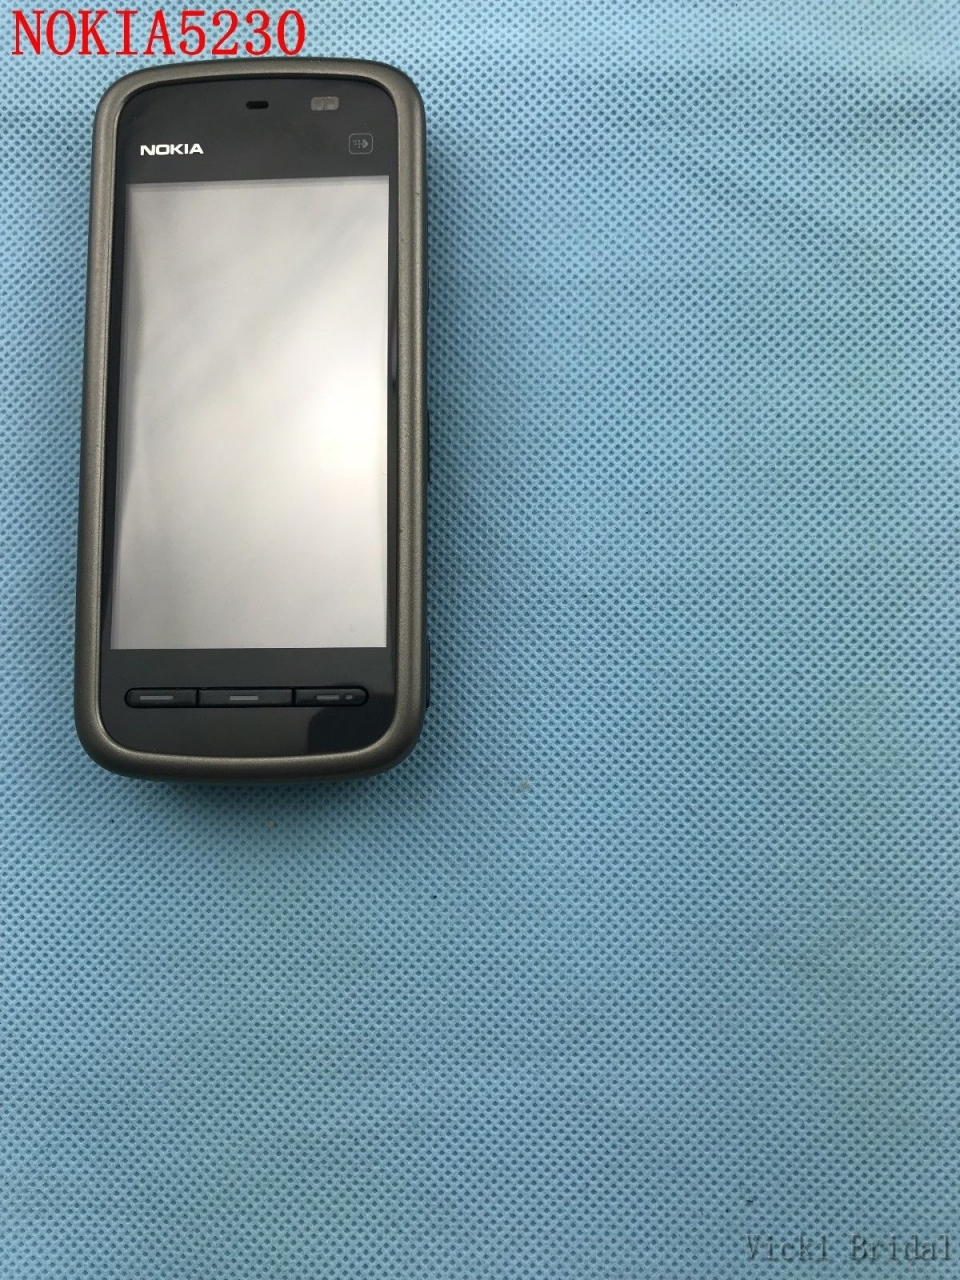 "Refurbished smartphone Nokia 5230 GPS 3G 3.2"" Bluetooth JAVA 2MP Unlocked Mobile Phone white 17"